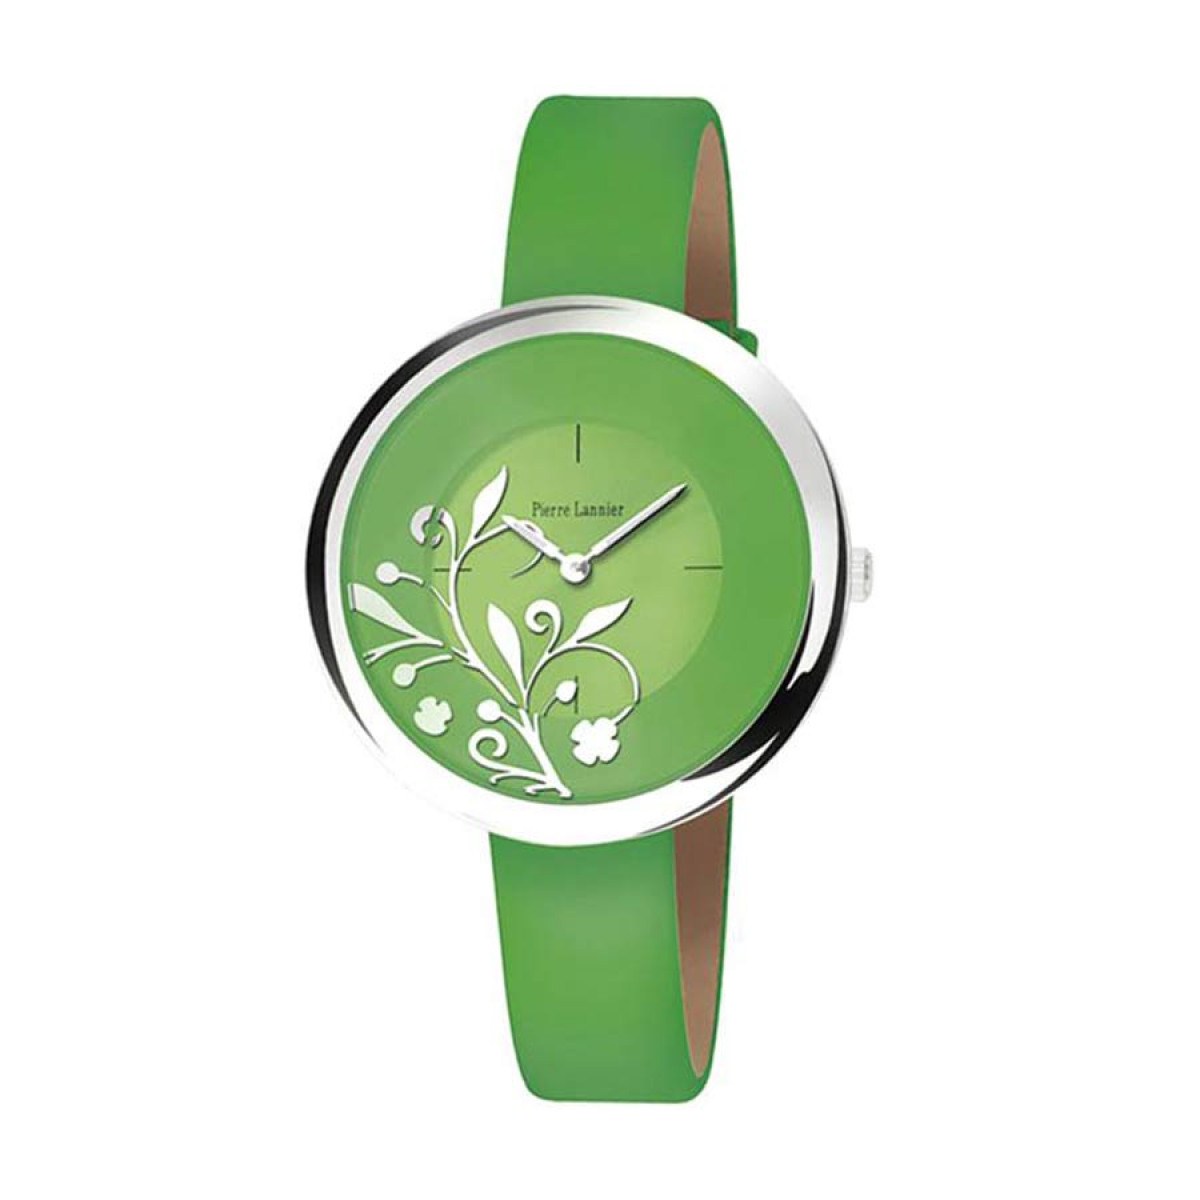 Часовник Pierre Lannier 020G677